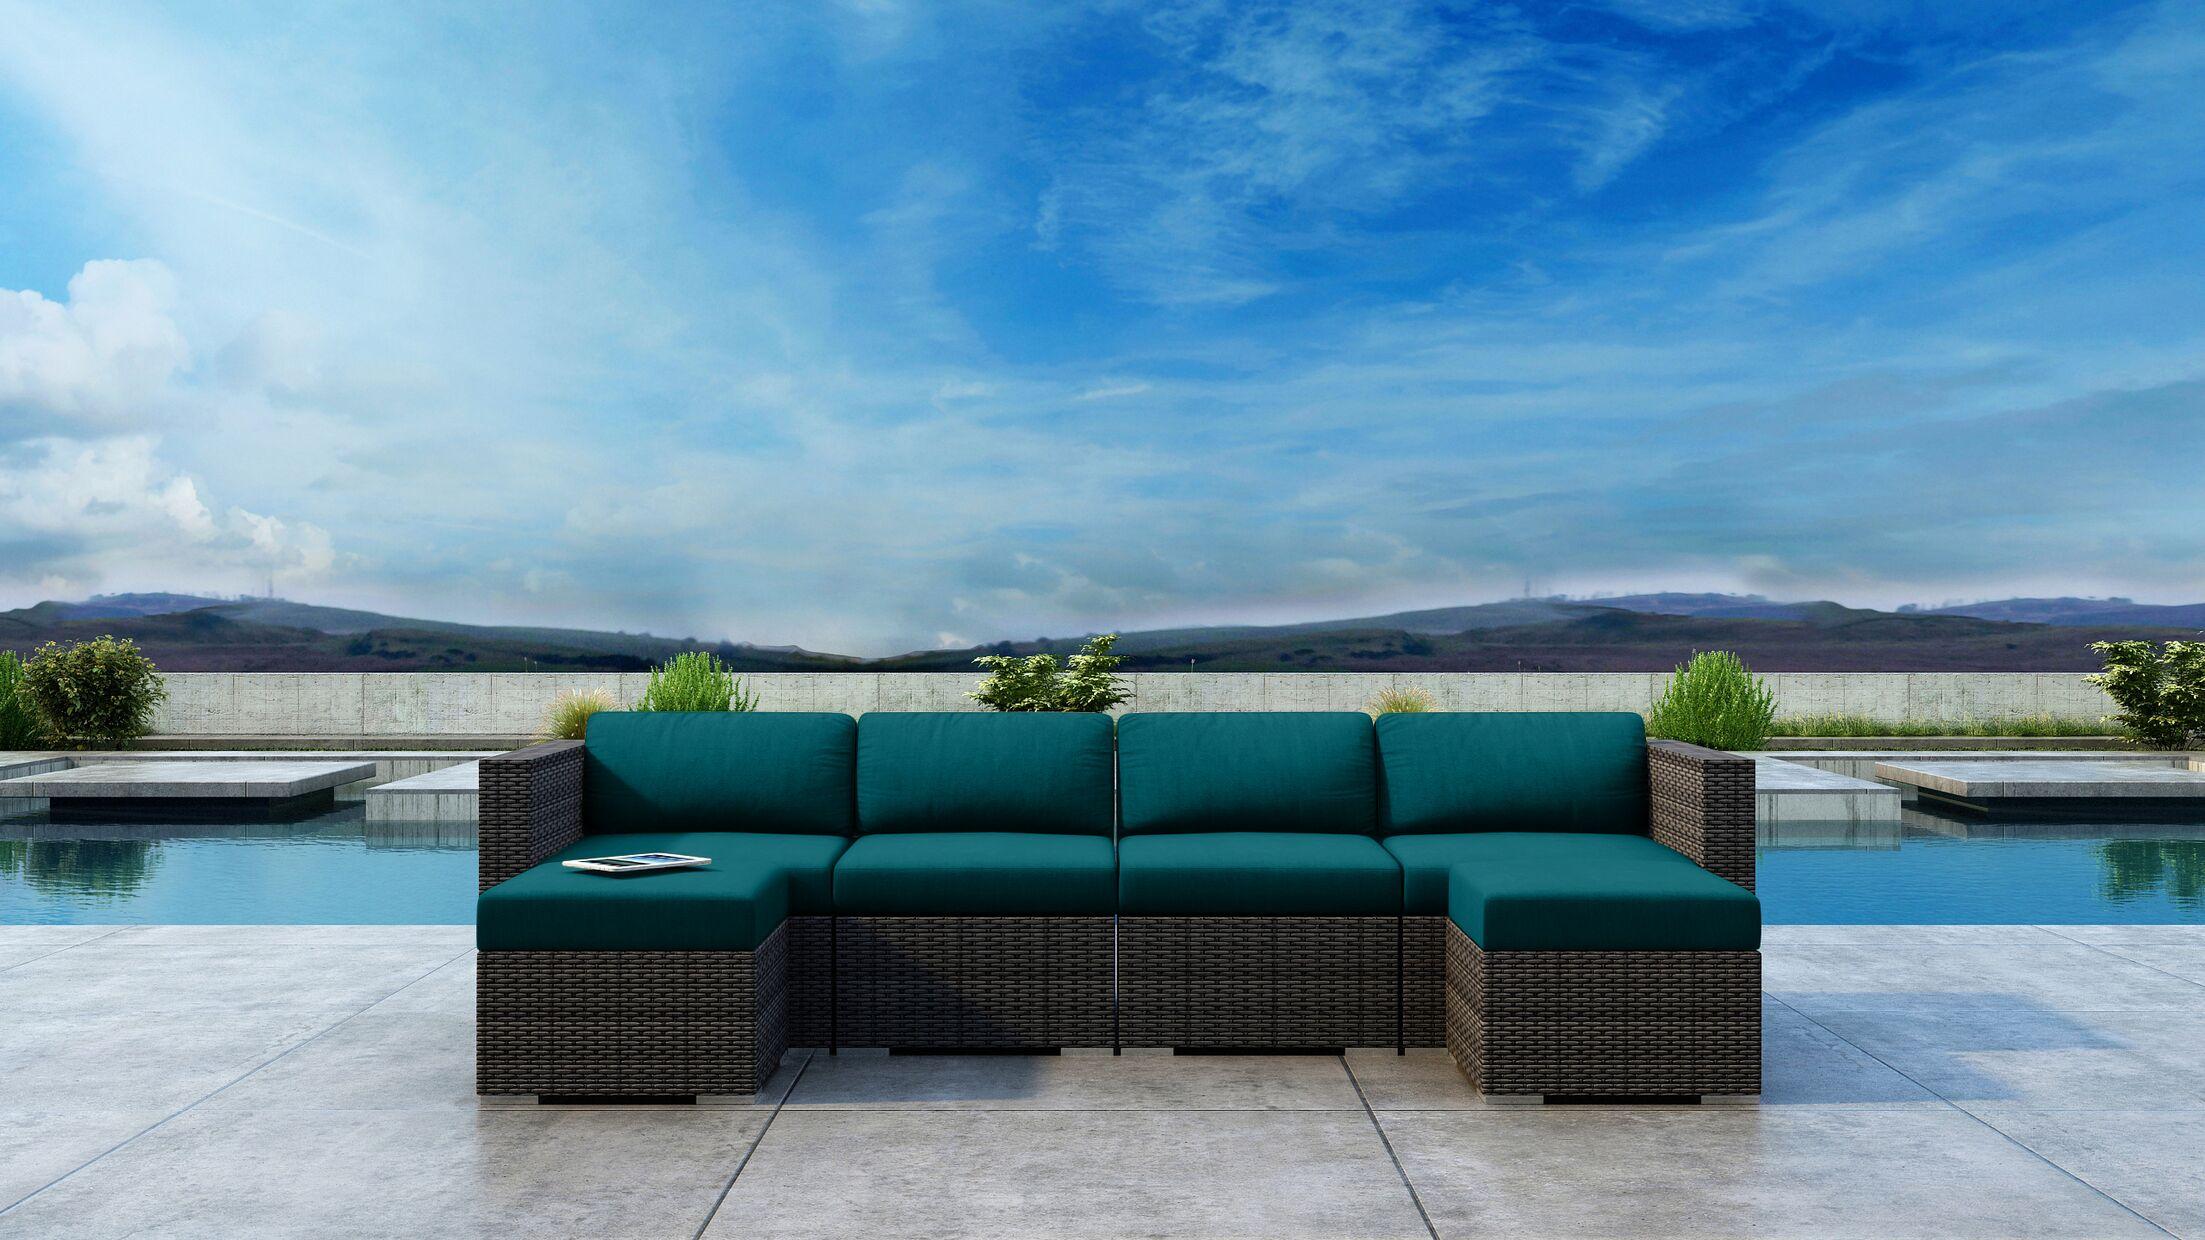 Gilleland 6 Piece Sectional Set with Sunbrella Cushion Cushion Color: Spectrum Peacock